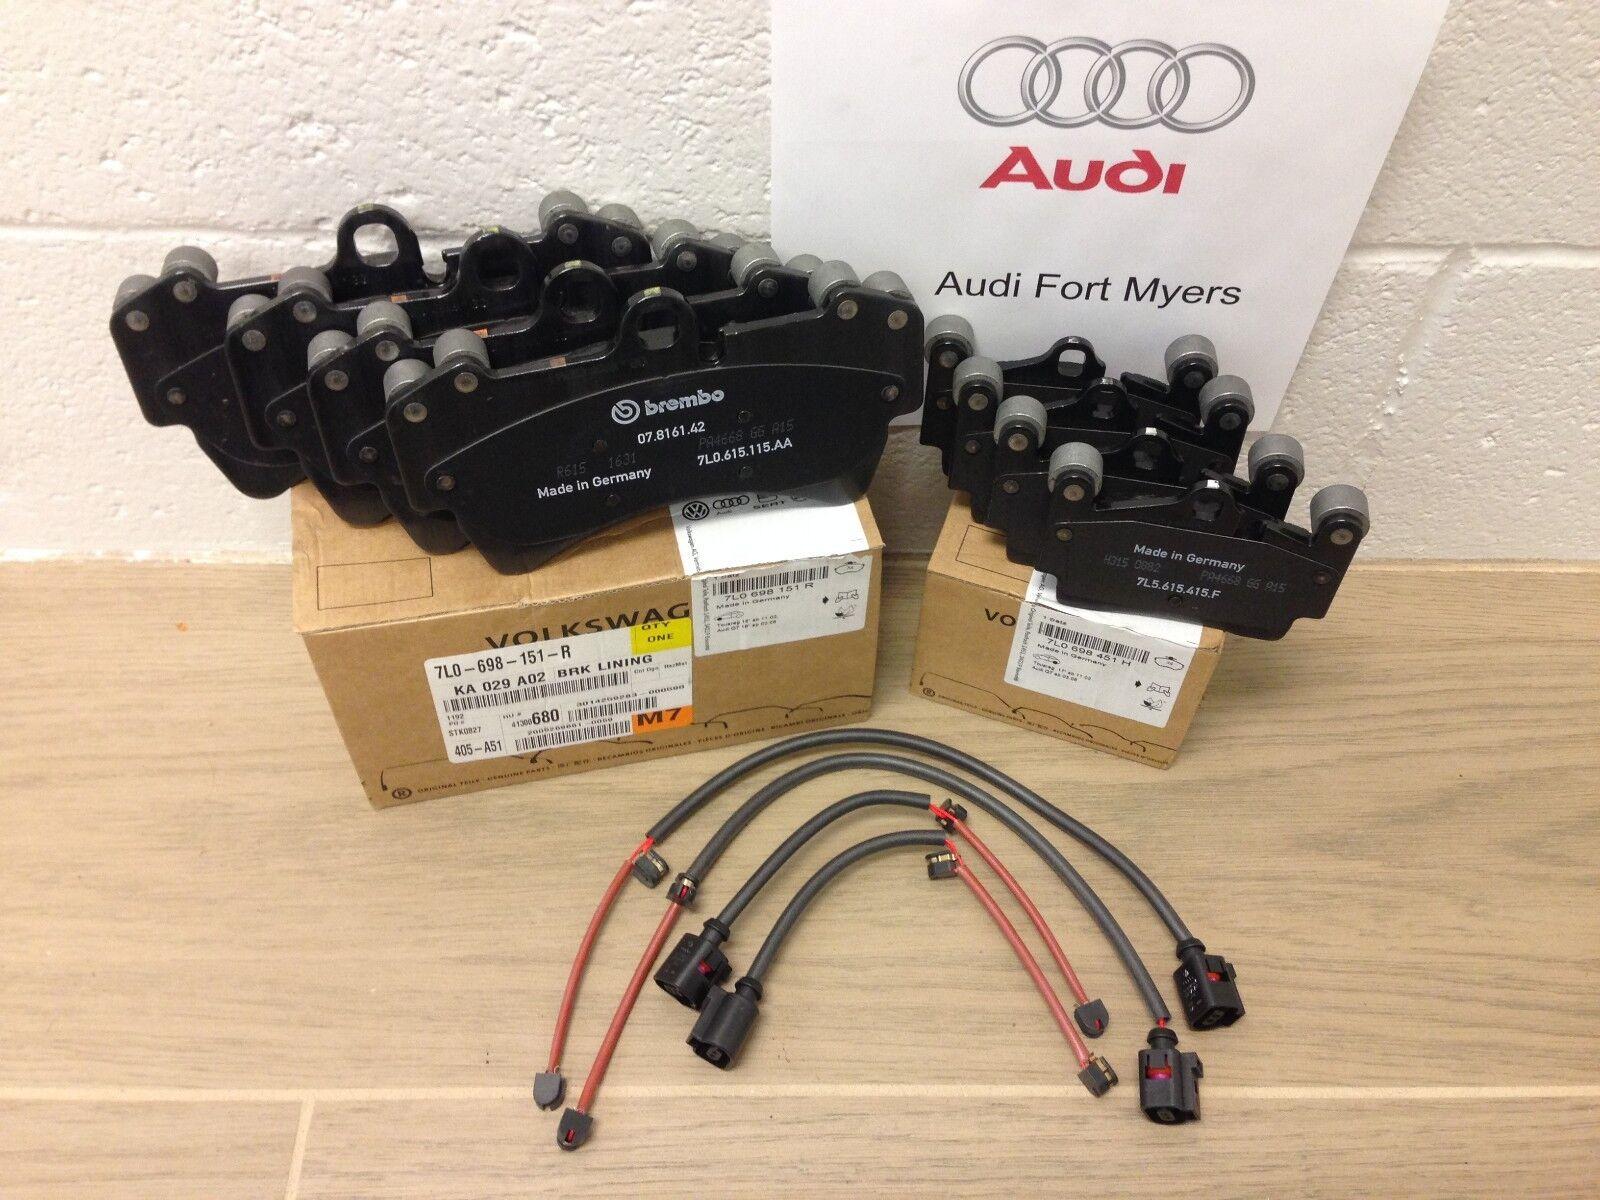 Sline - rotors/pads question - Page 3 - AudiWorld Forums